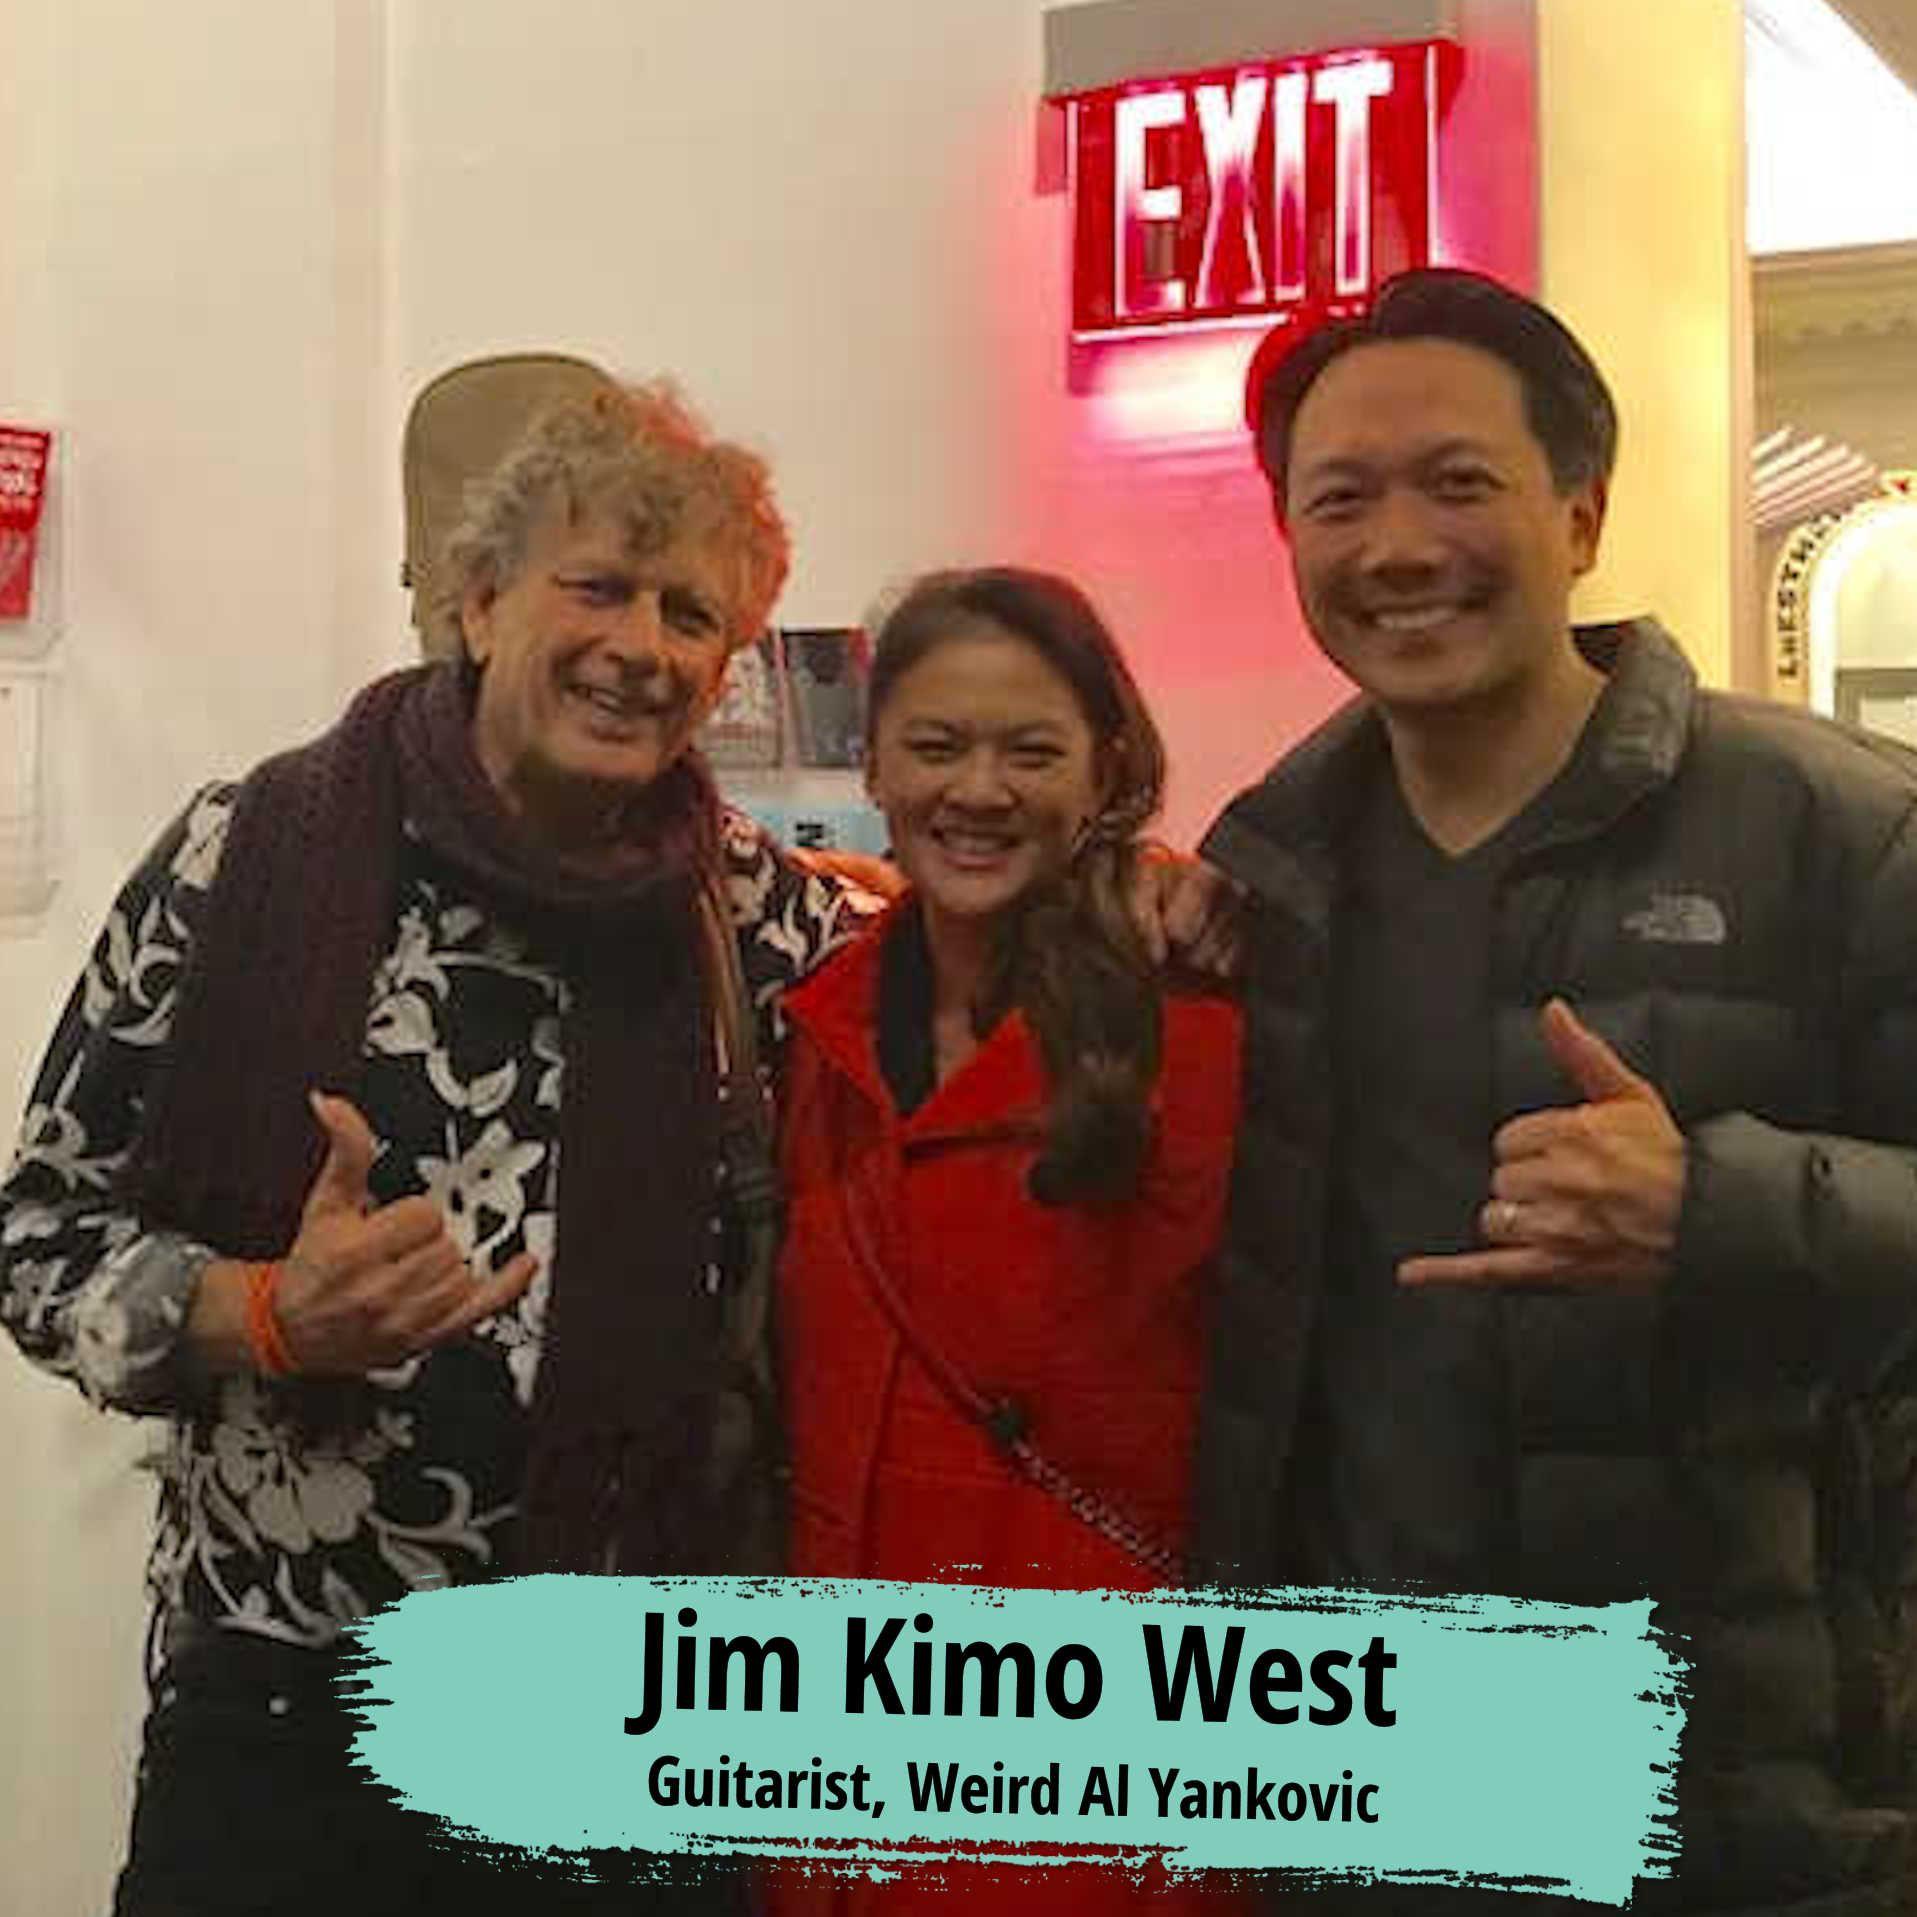 kimo west